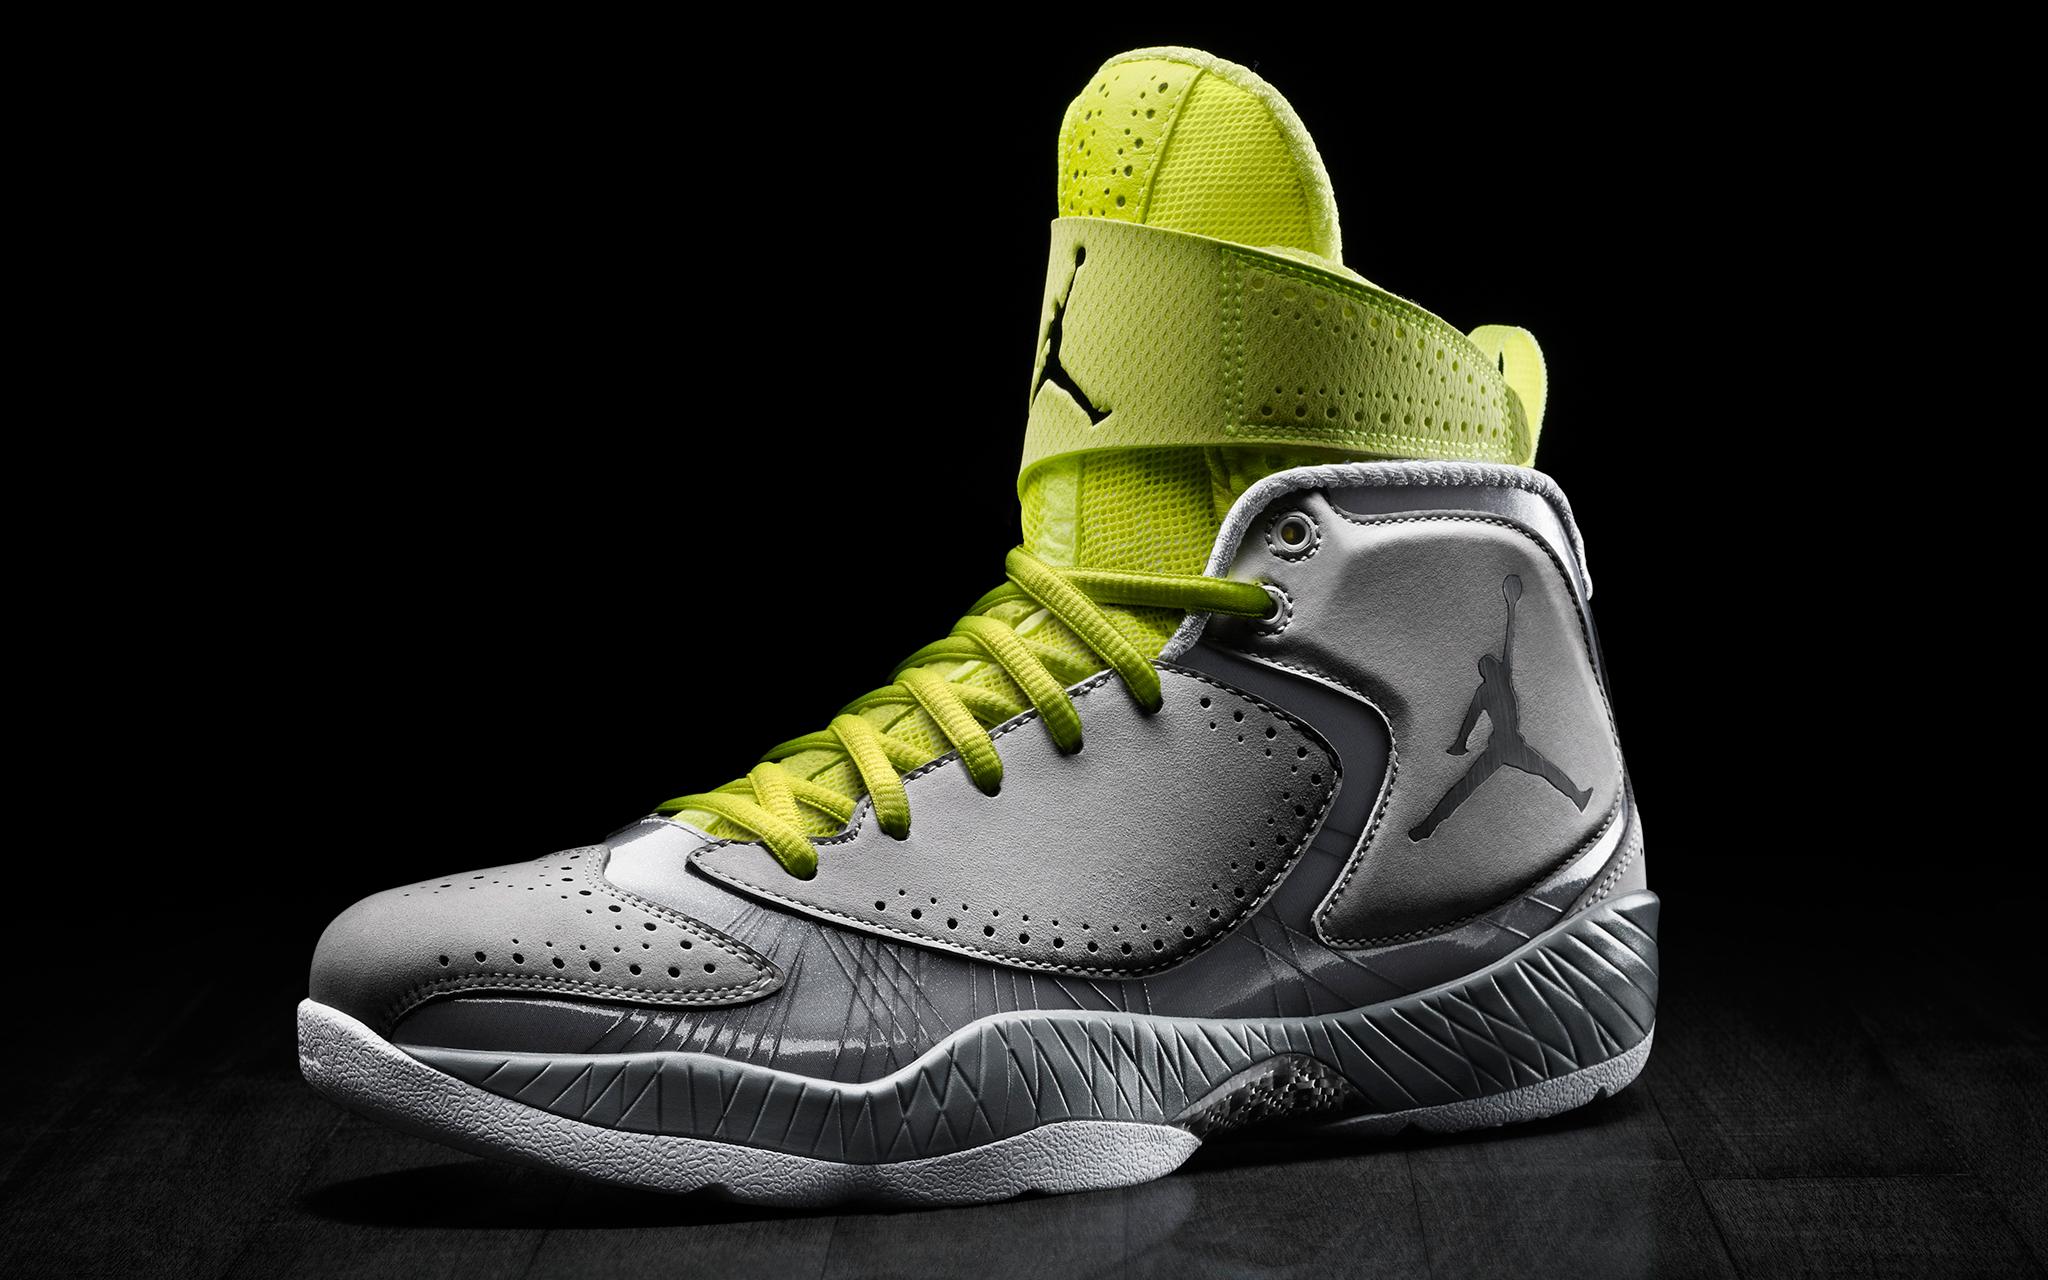 Nike Air Jordan Xx7 Nike Air Jordan Pink